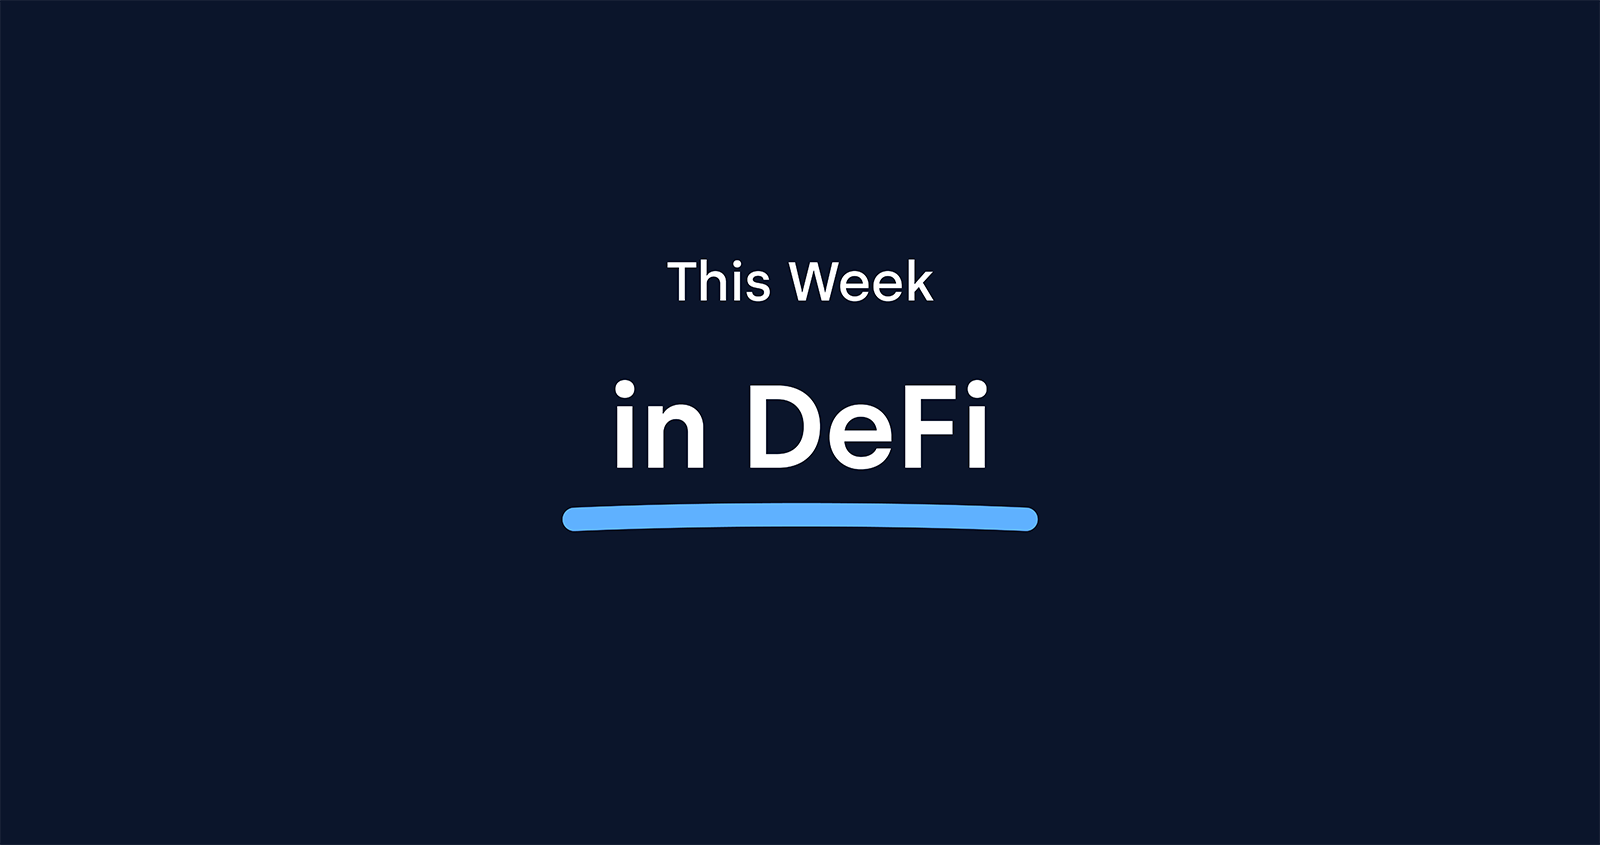 OKCoin DeFi update, Ethereum 2.0 update Ethereum serenity